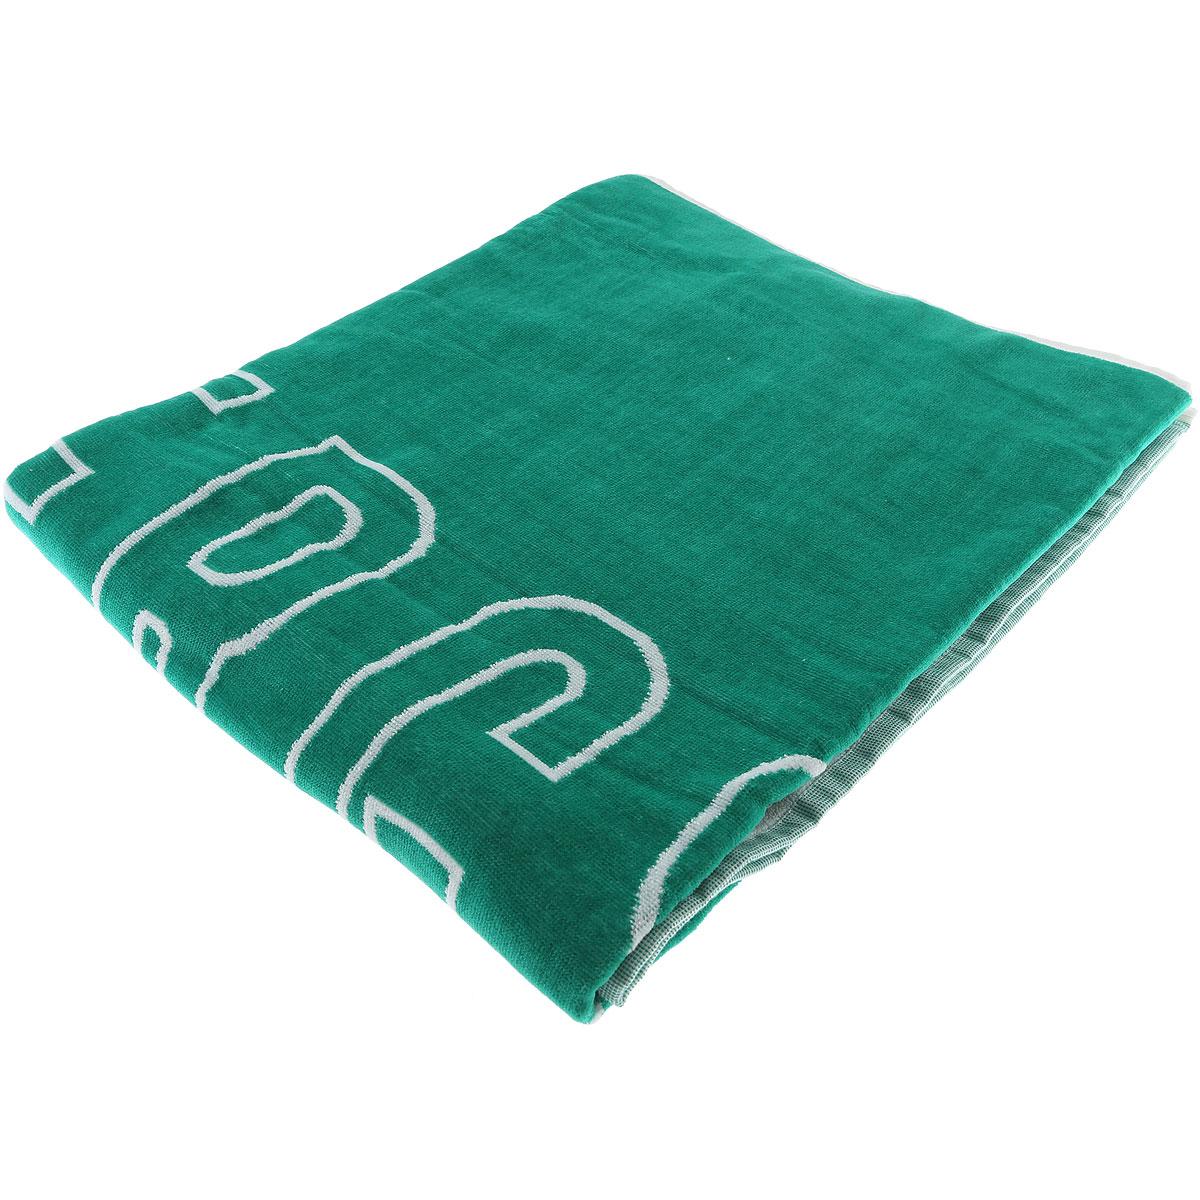 Image of Dirk Bikkembergs Beach Towel On Sale, Green, Cotton, 2017